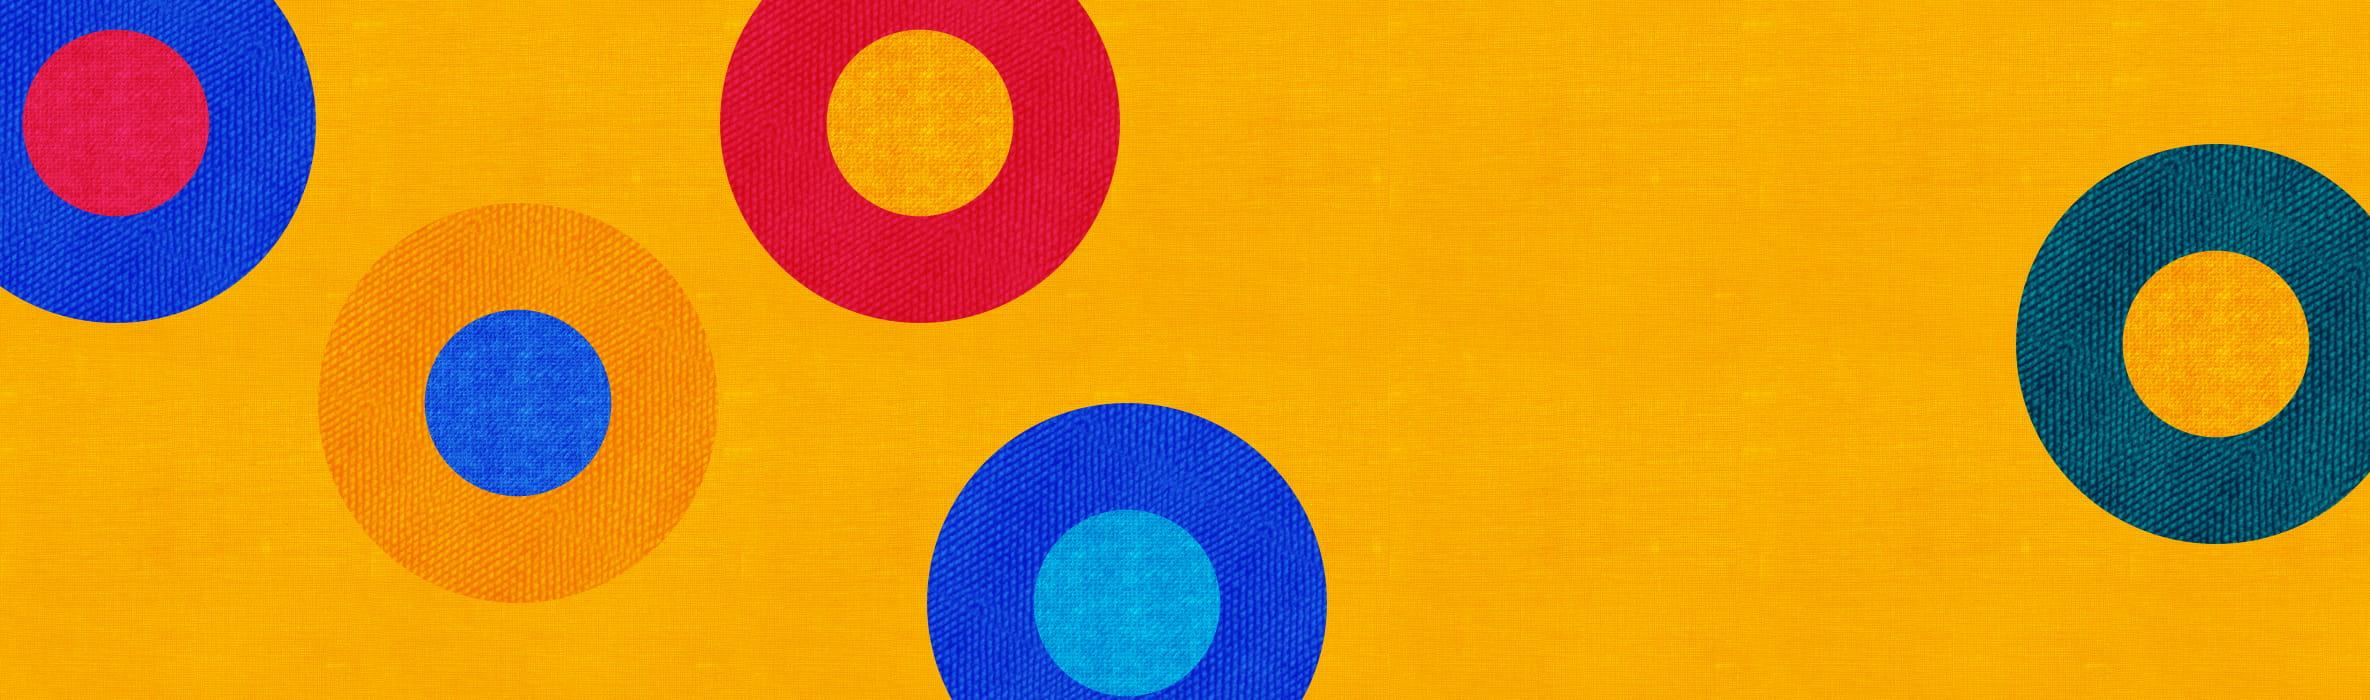 multicoloured circle on an orange background